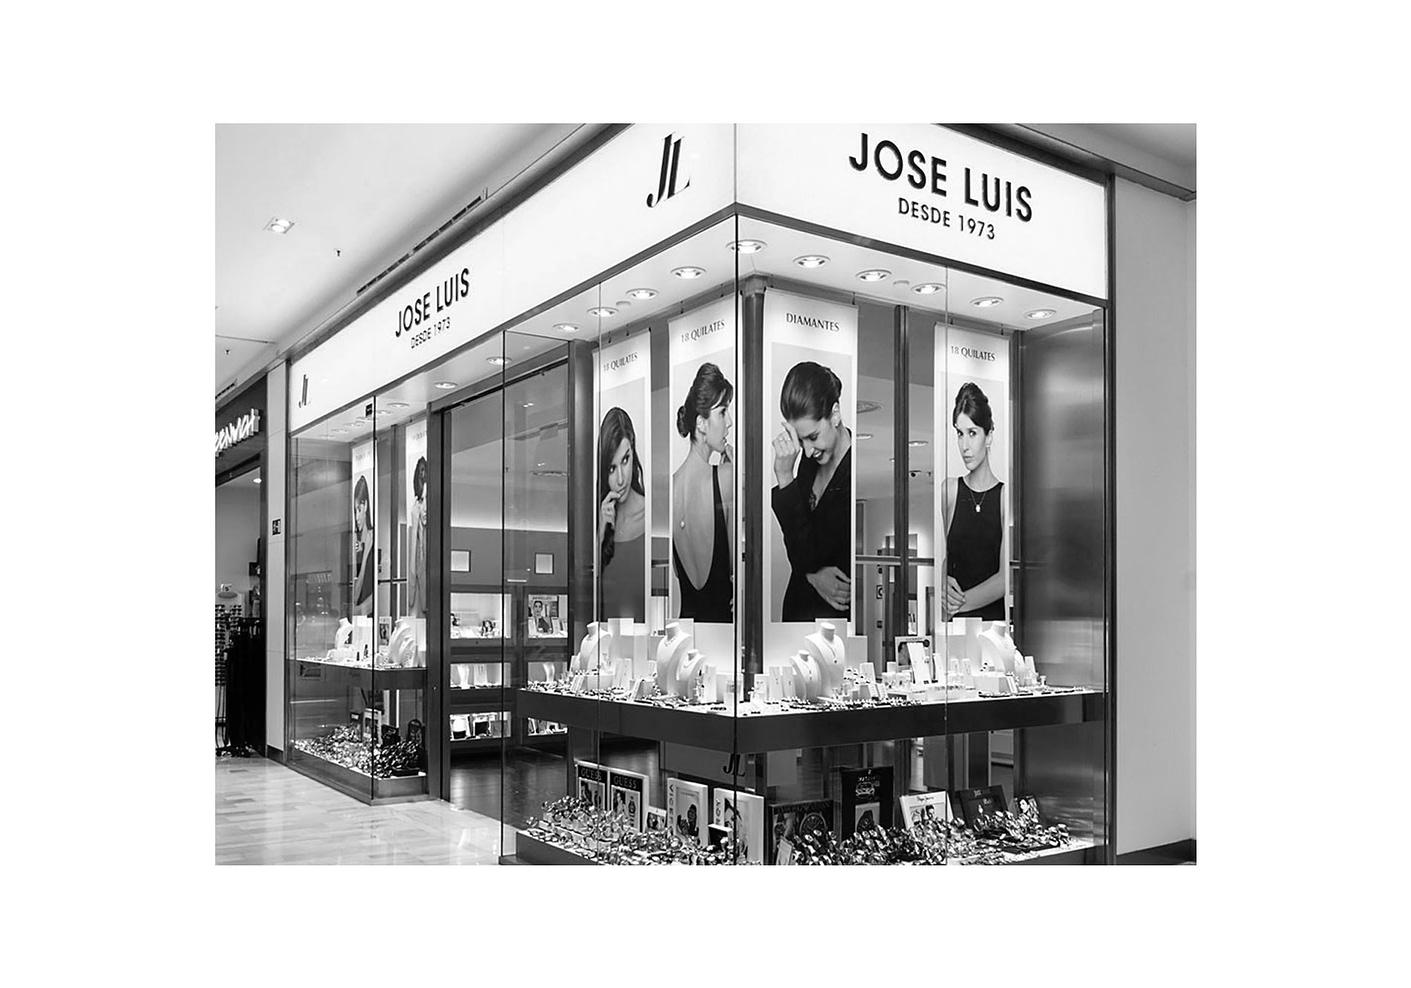 JoseLuis-joyerias-tienda1